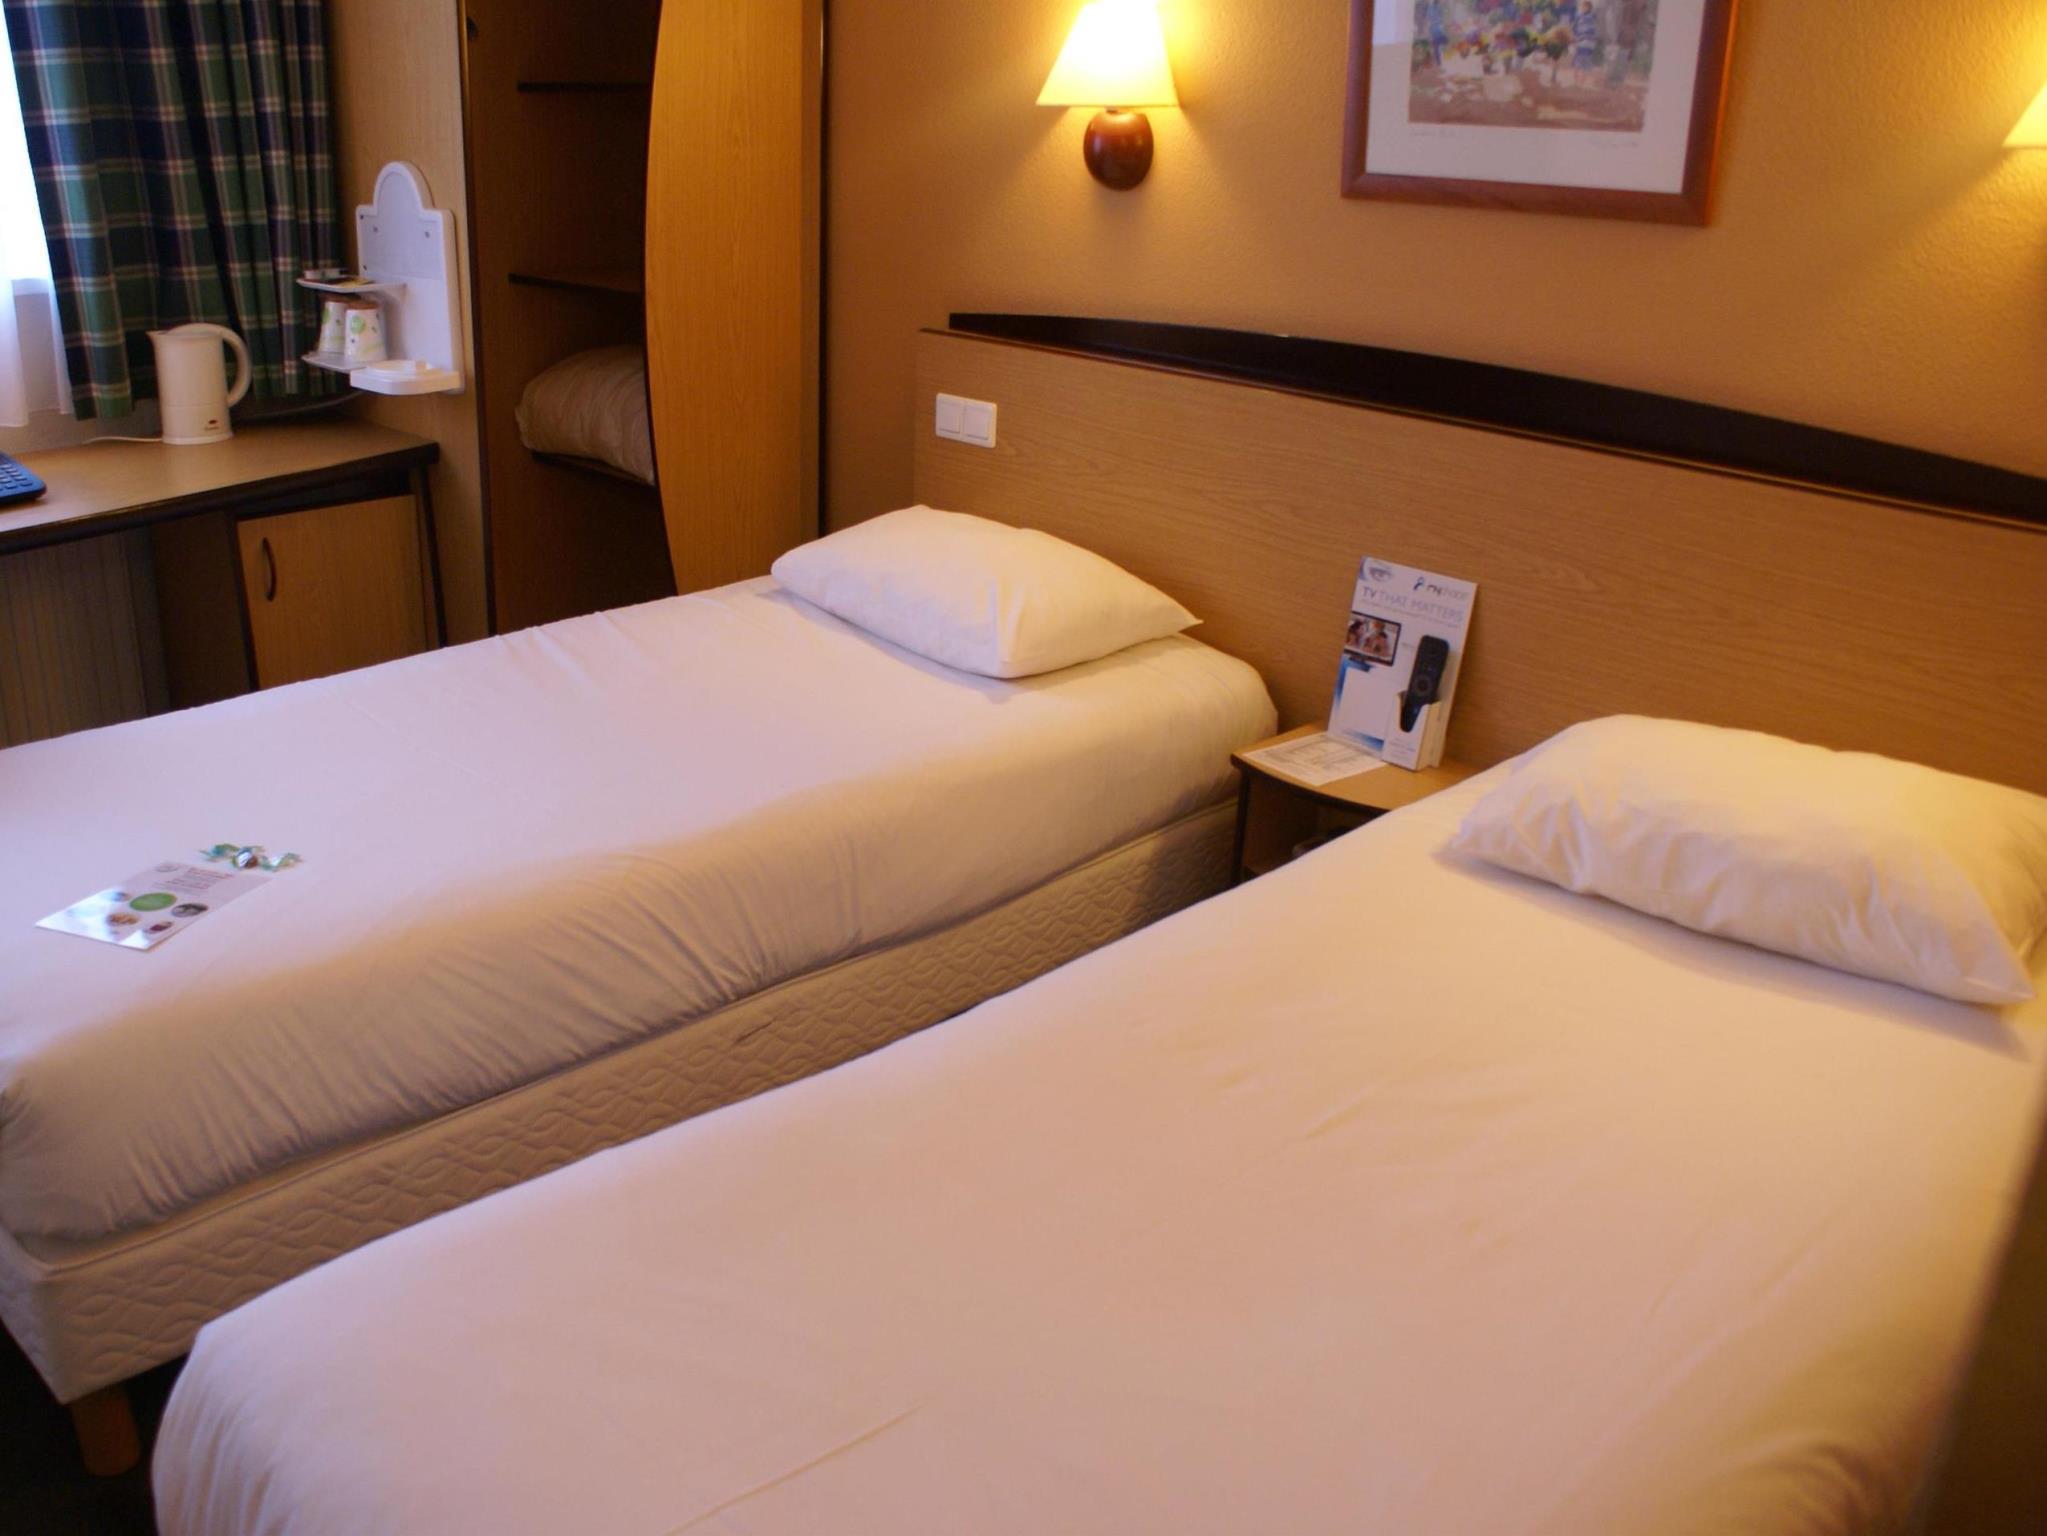 Campanile Hotel Breda, Breda